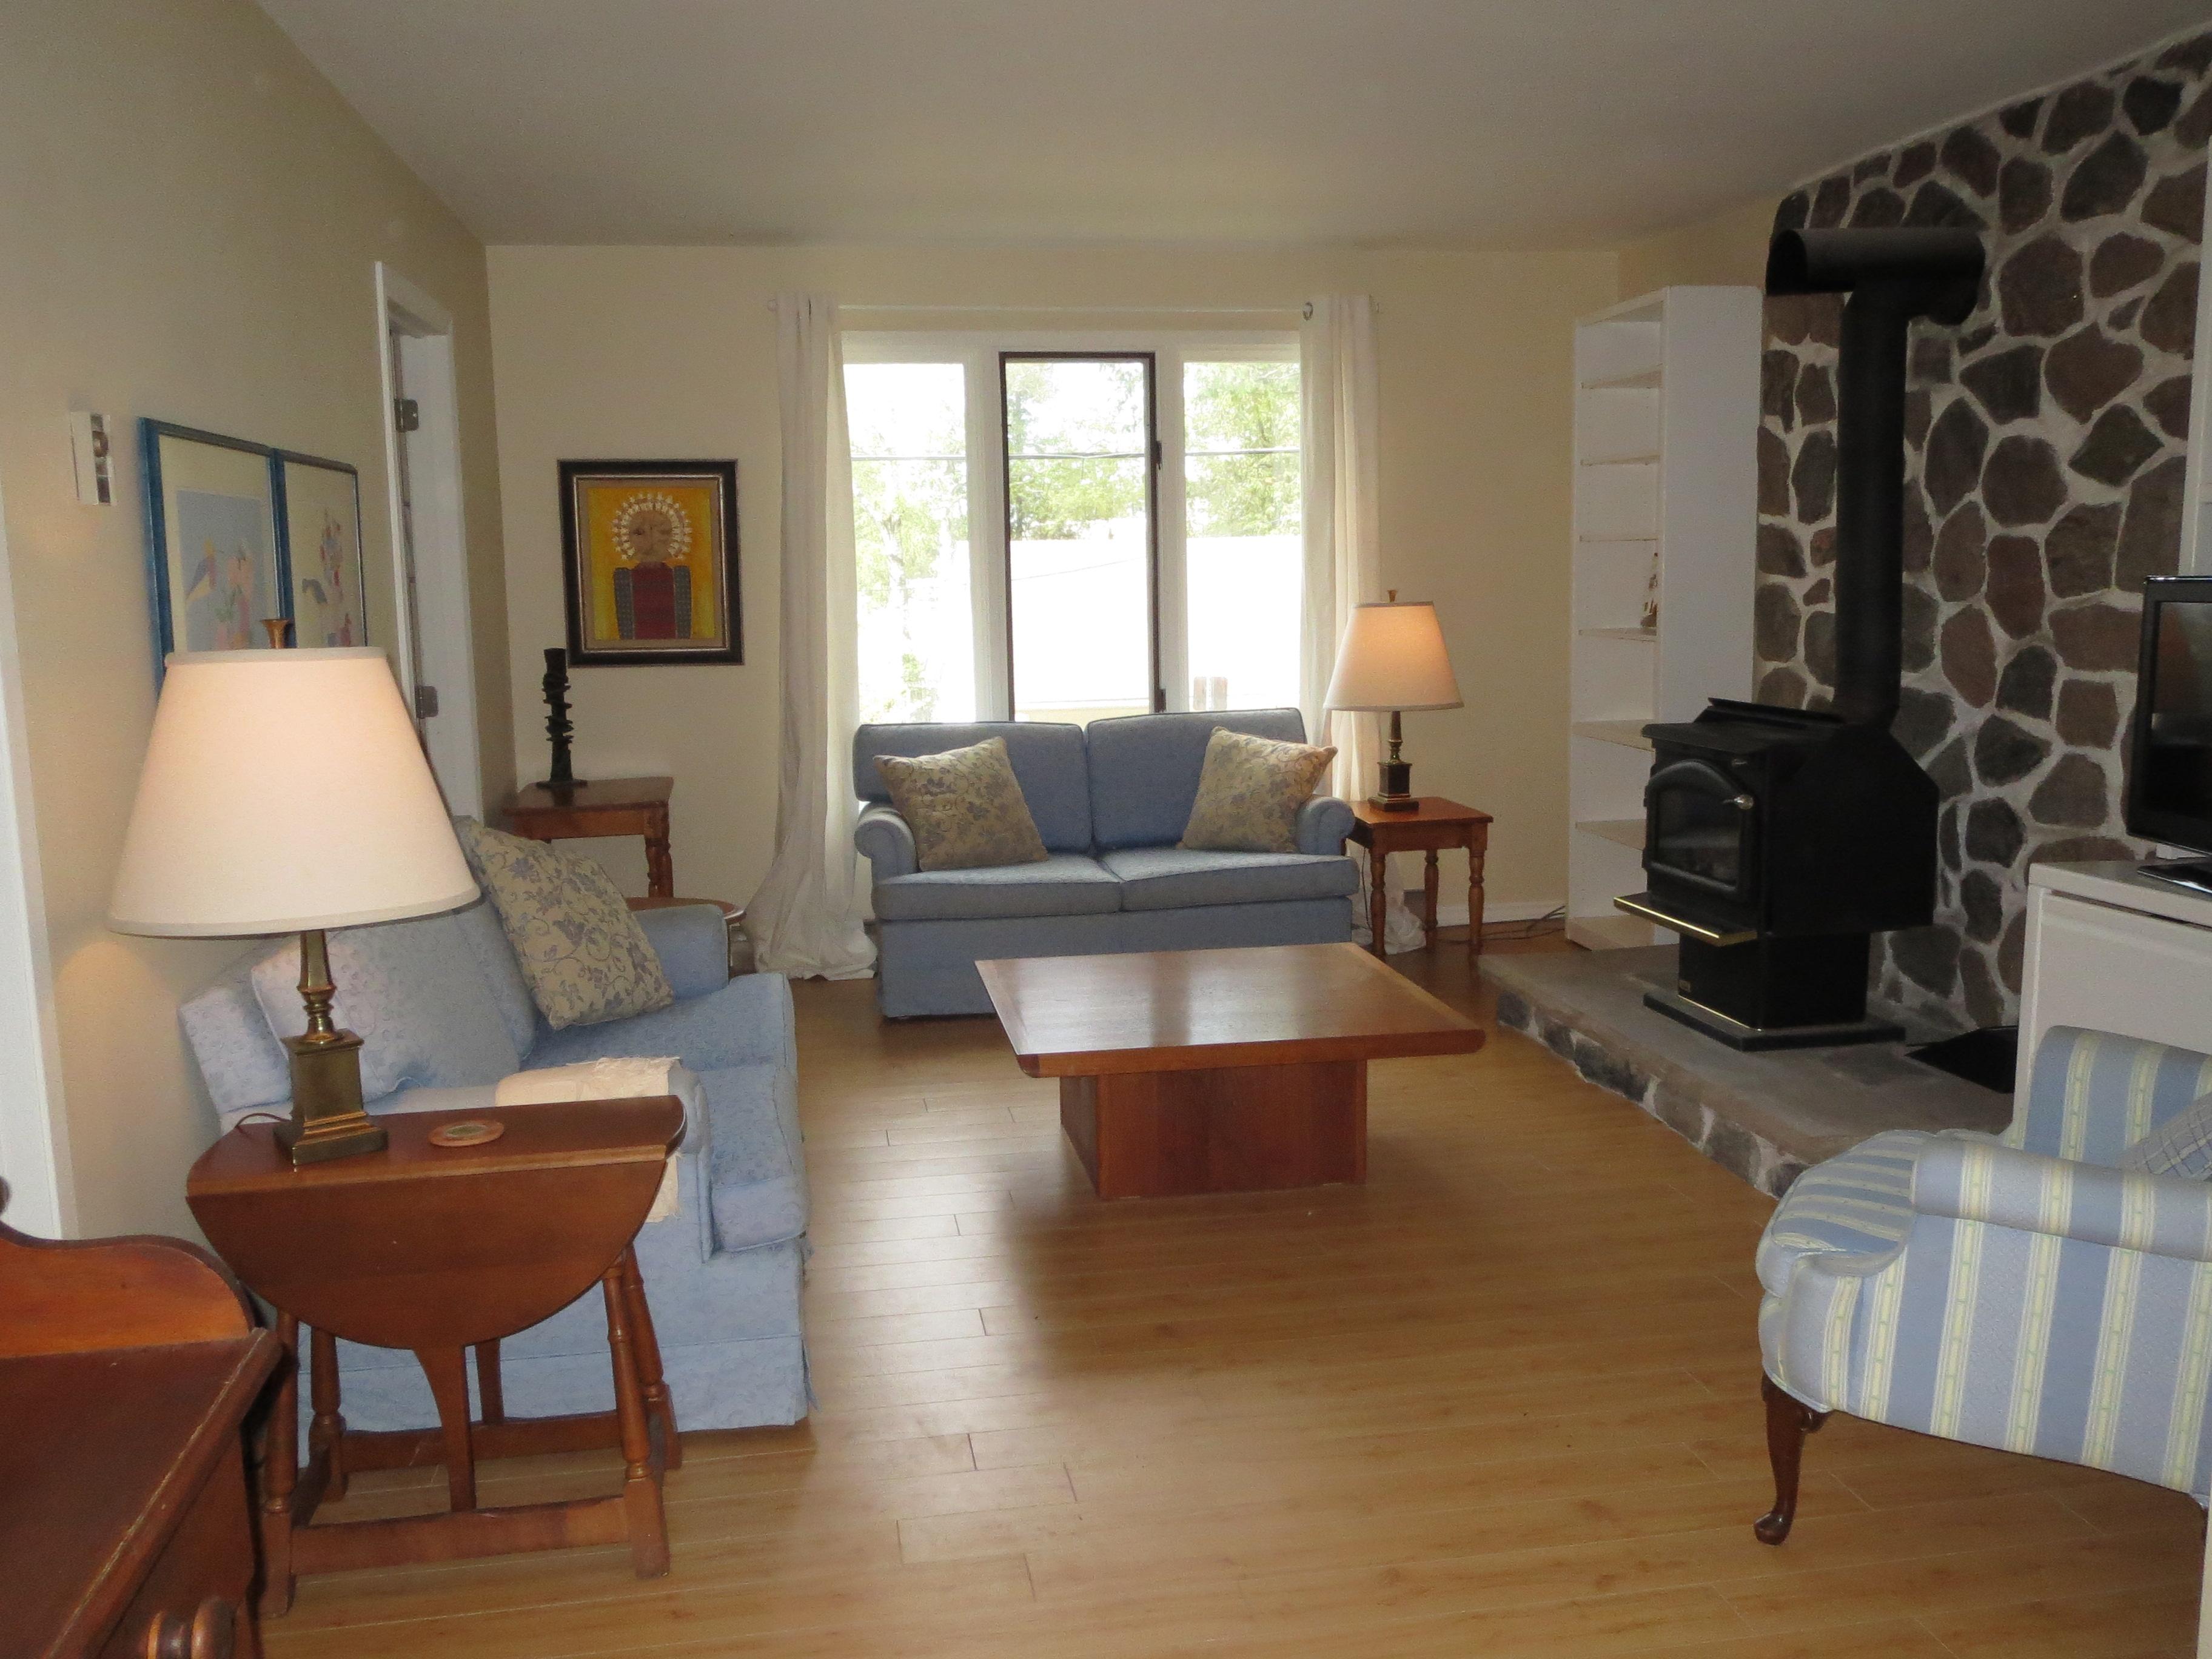 14 Living Room 1